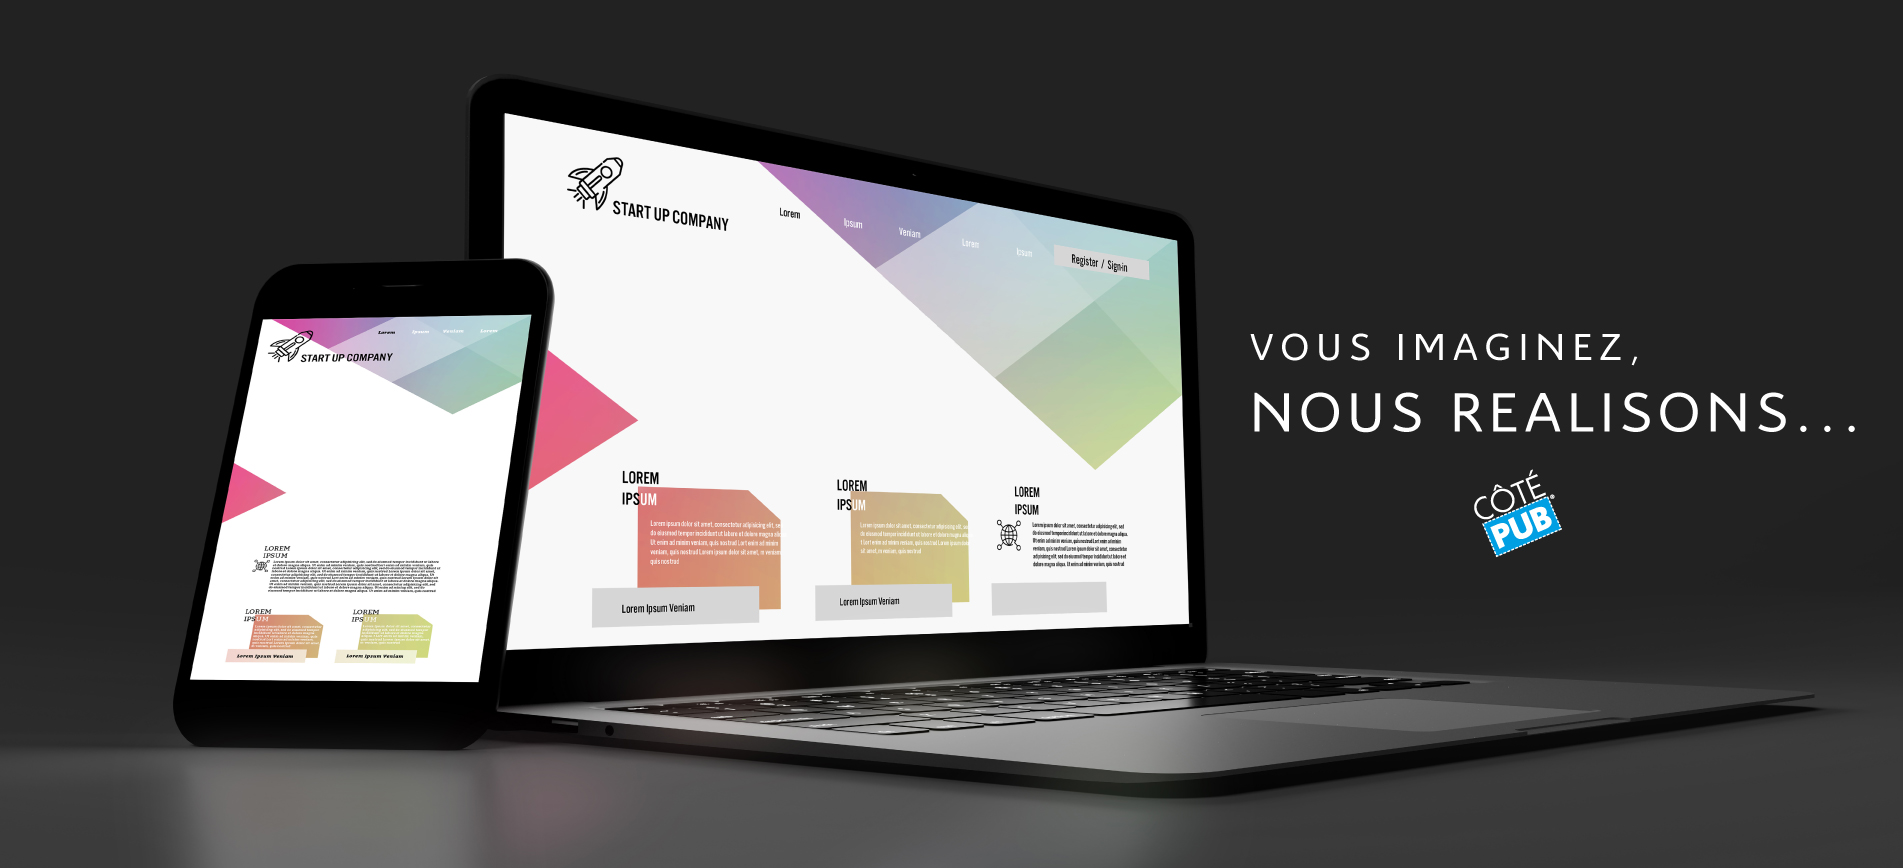 webdesigner-concepteur-web-site-internet-pas-cher-ajaccio-bastia-la-ciotat-gemenos